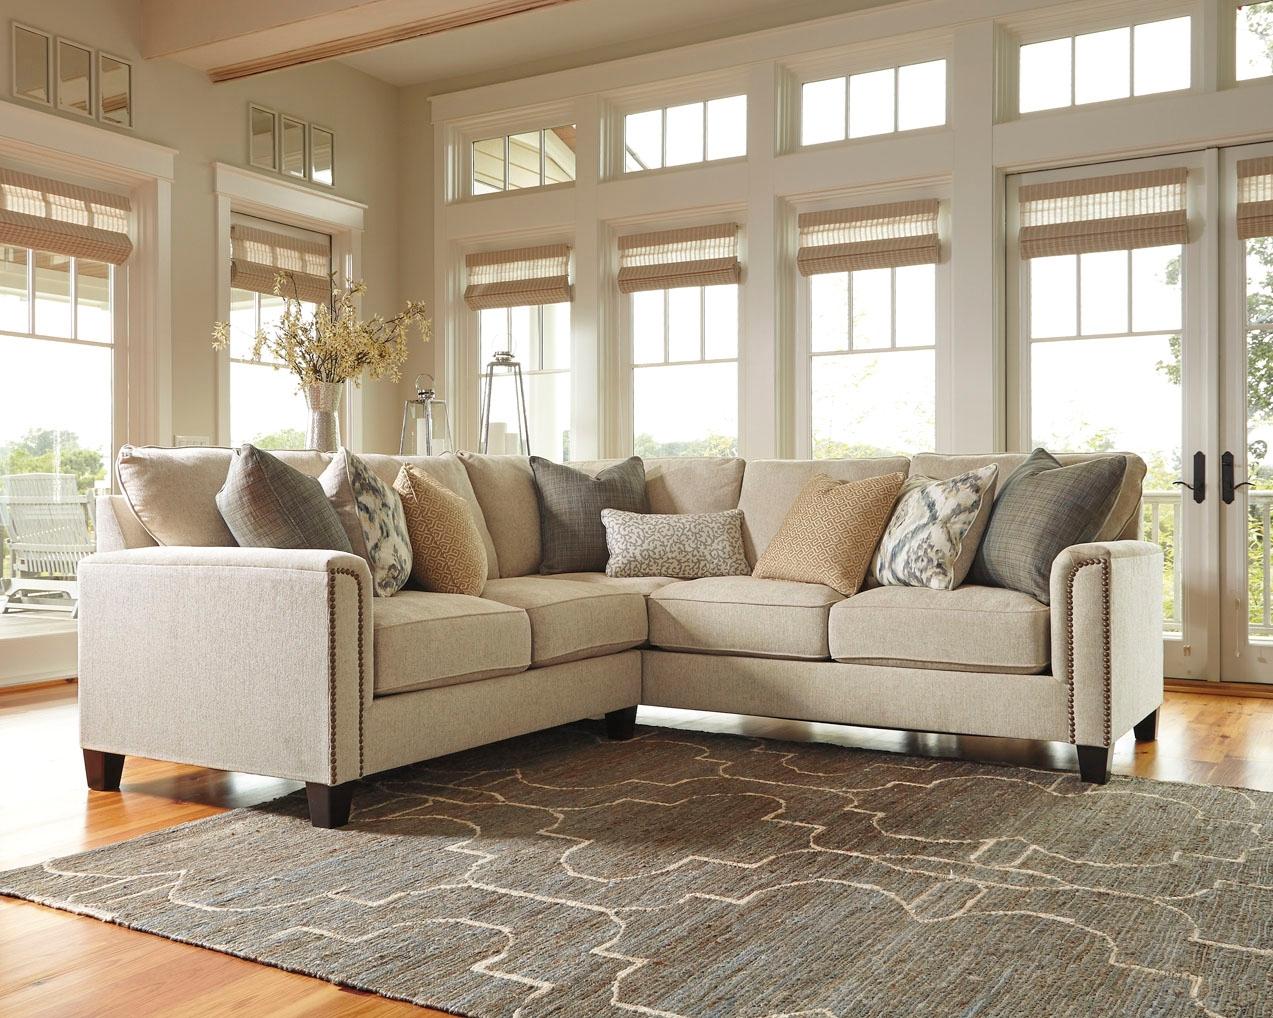 Kieman Sectional Sofa: Kieman 2-Piece Sectional